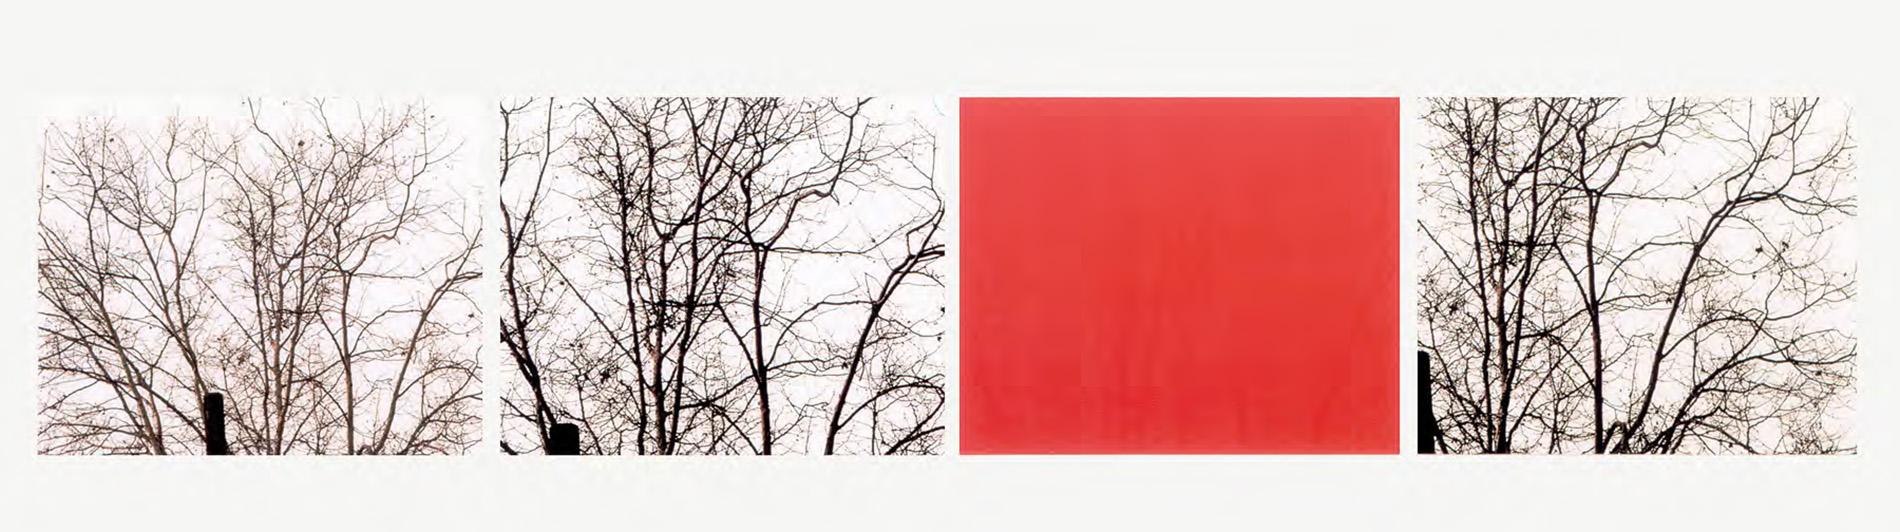 Uta Barth white blind (bright red) (02.13) 2002 fa...